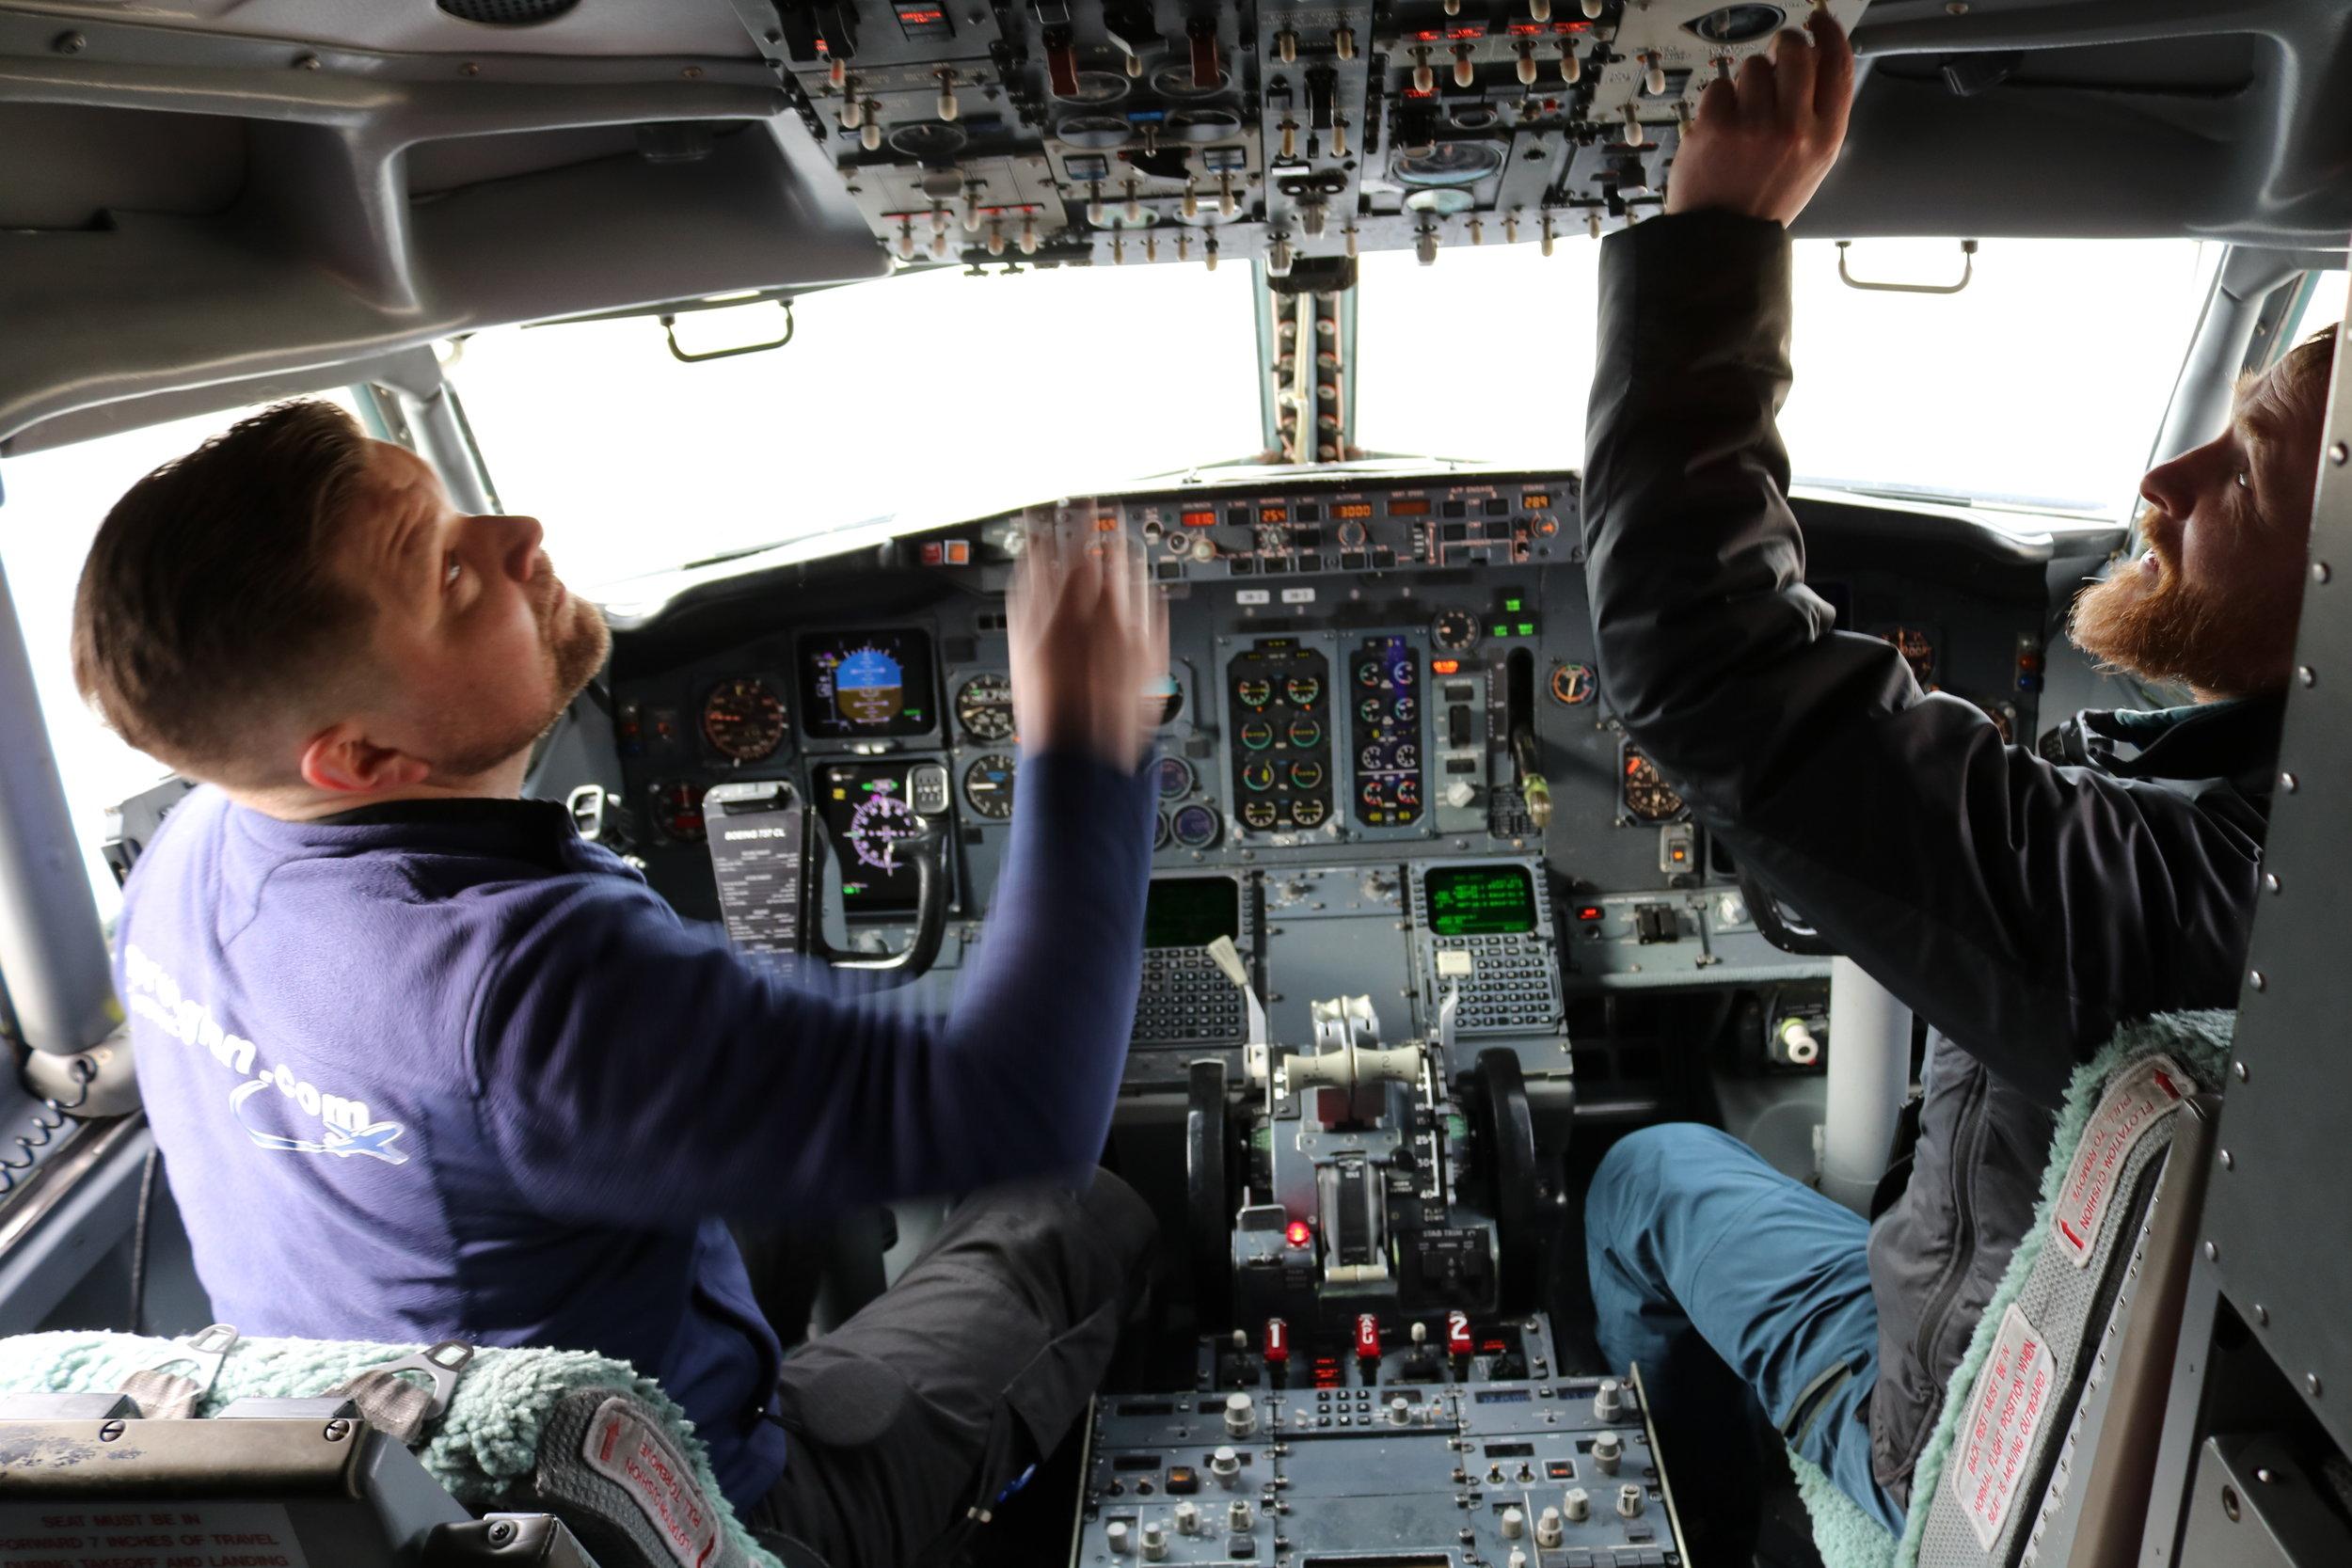 - Alt virker som det skal, det er helt helt utrolig, sier Holstad under test i cockpit sammen med koservator Michael Loftus.